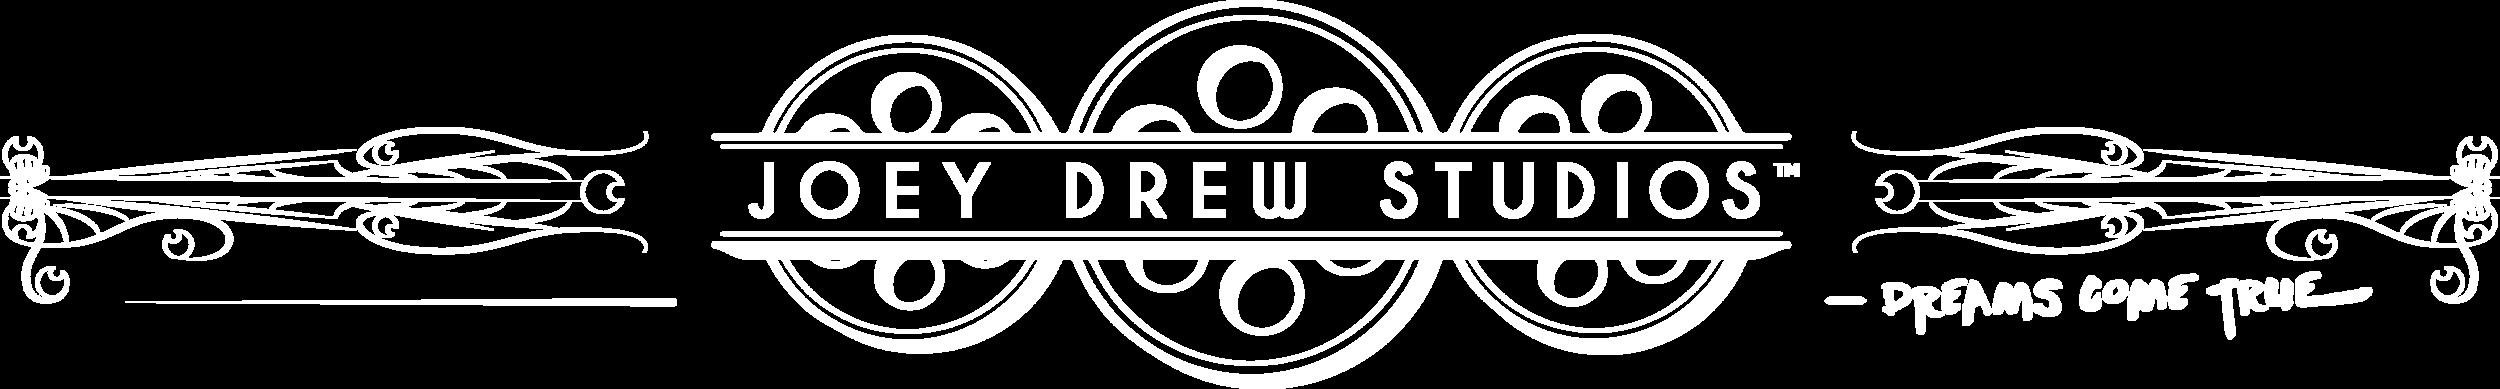 Joey Drew Studios